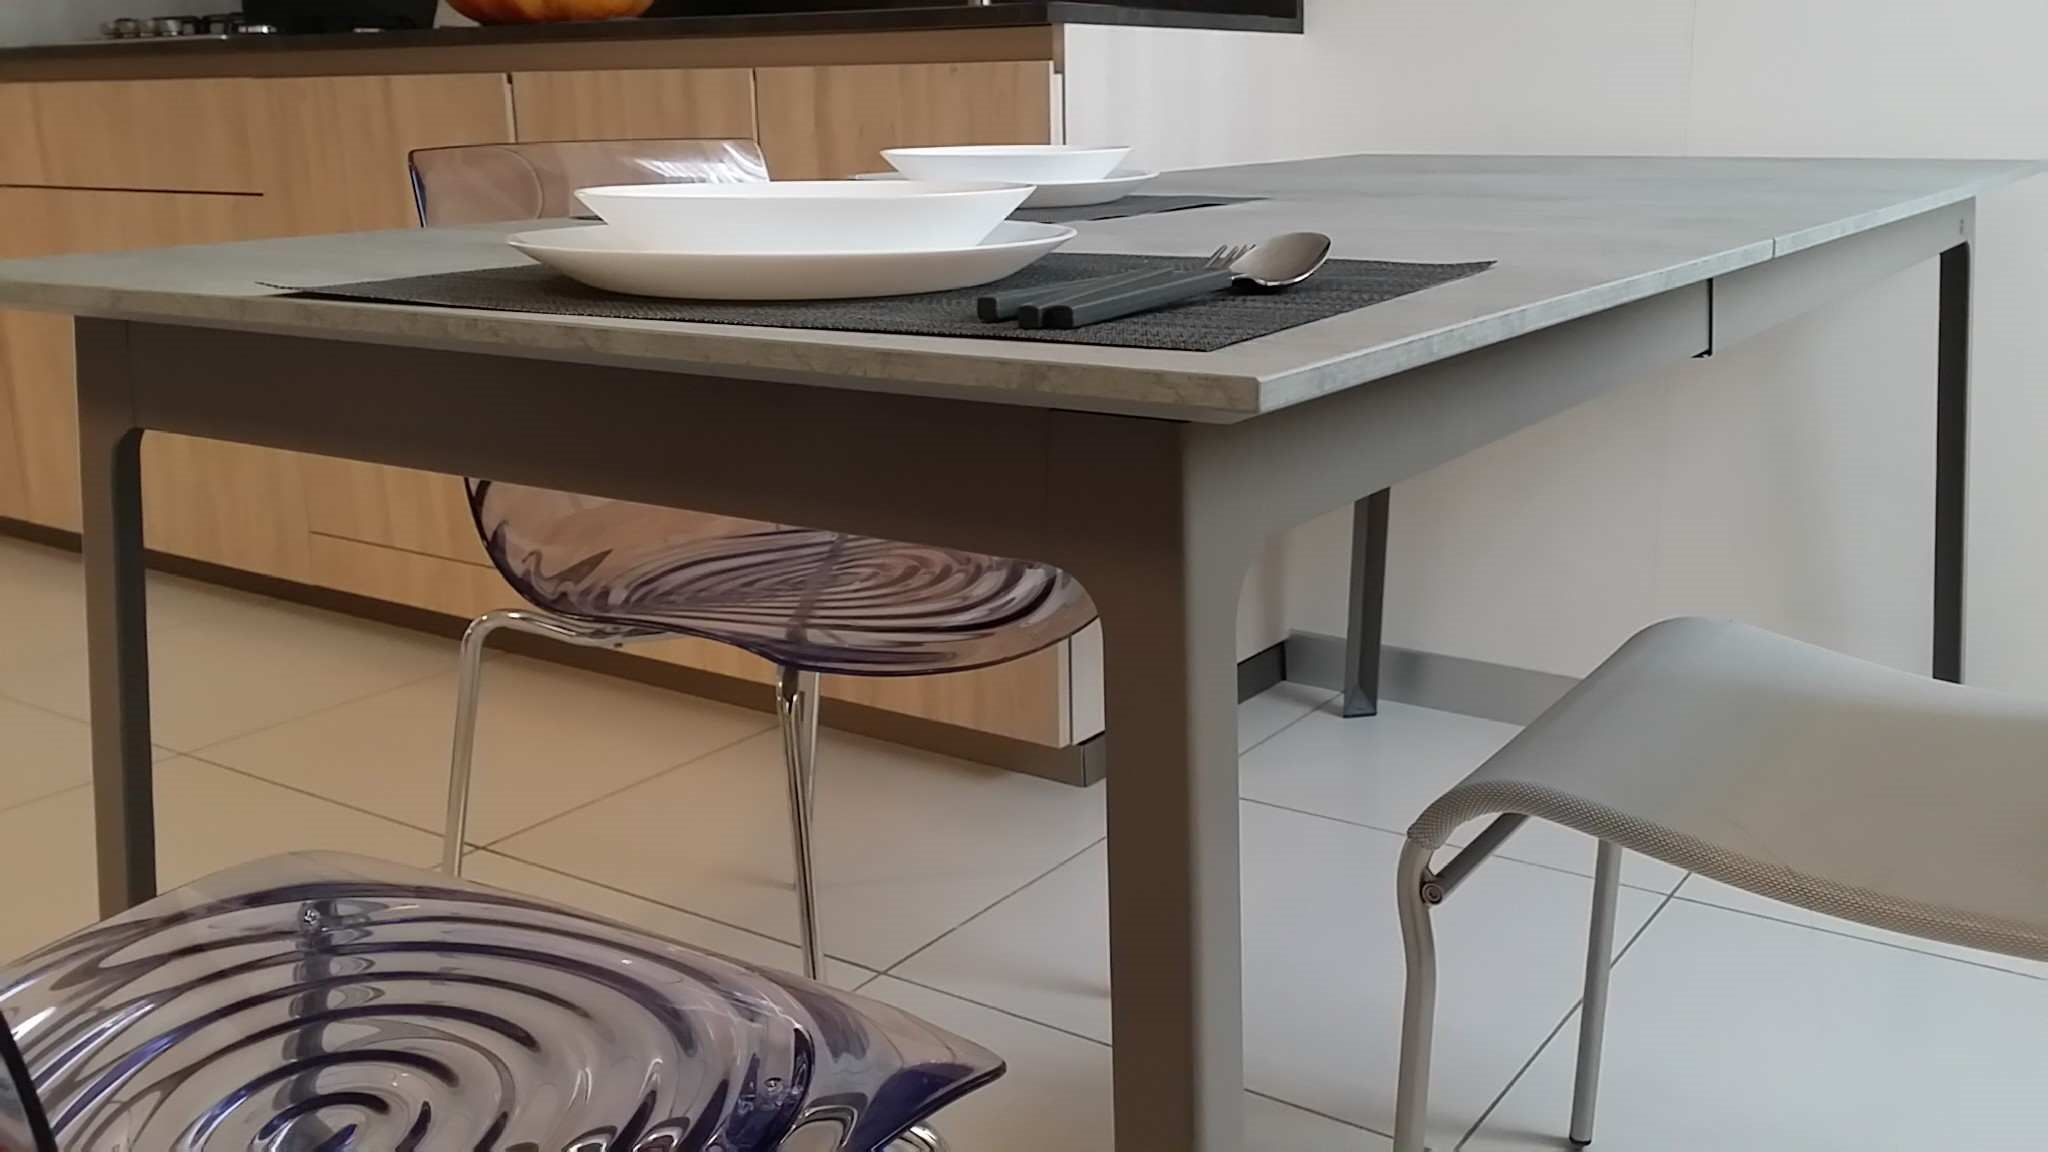 Outlet tavolo calligaris dot tavoli a prezzi scontati for Calligaris tavoli prezzi